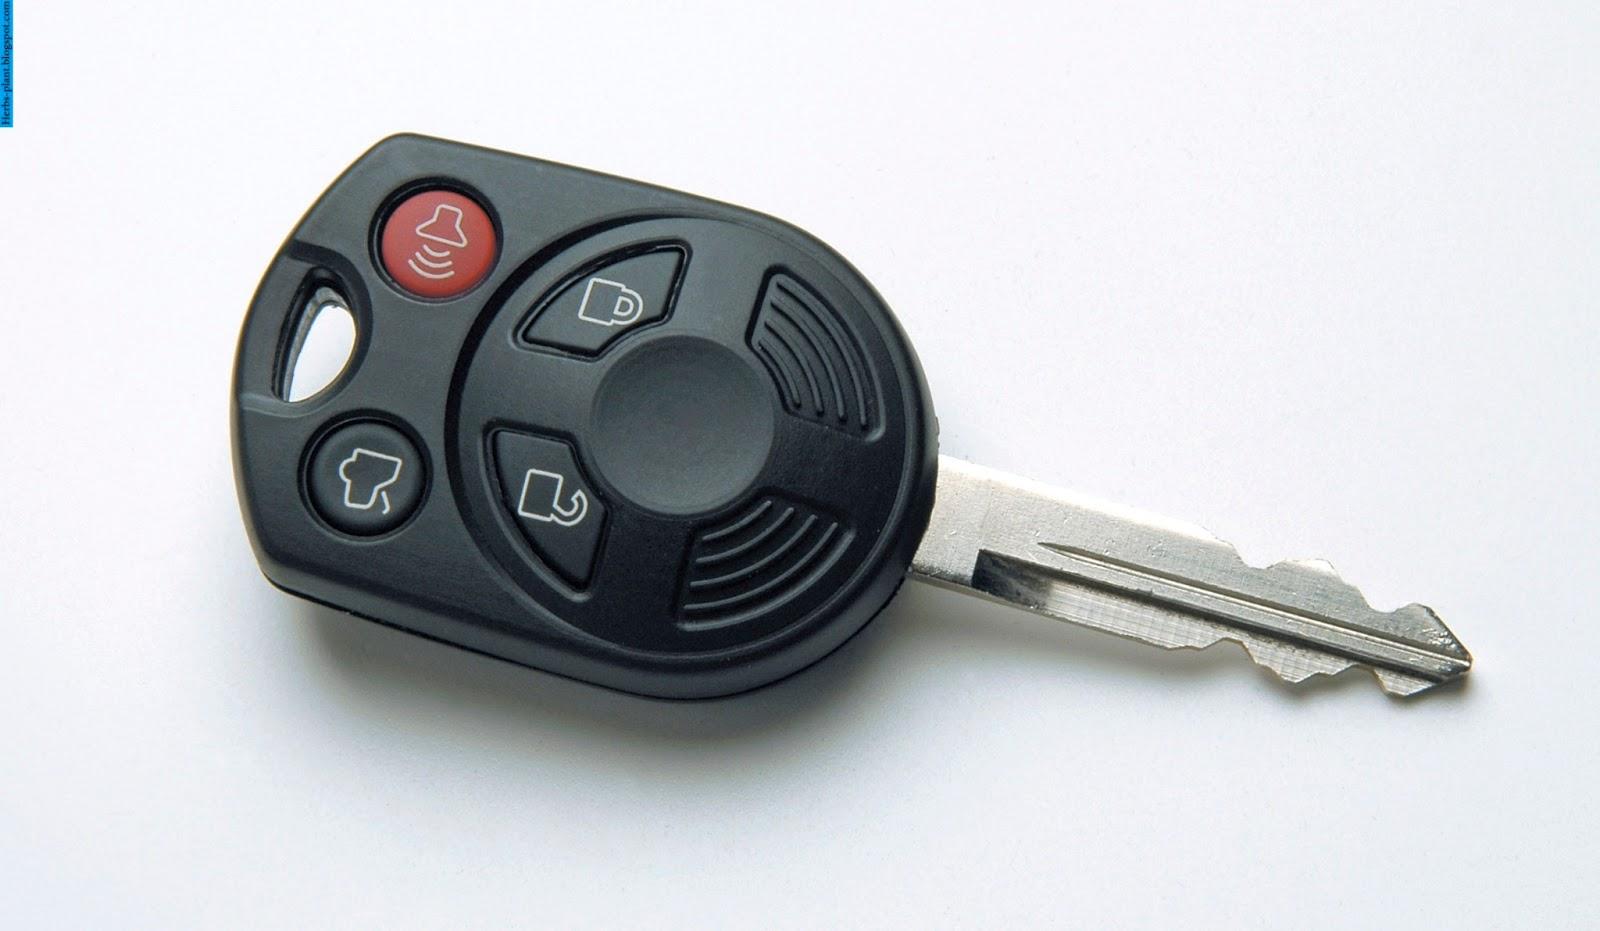 Ford expedition car 2013 key - صور مفاتيح سيارة فورد اكسبديشن 2013